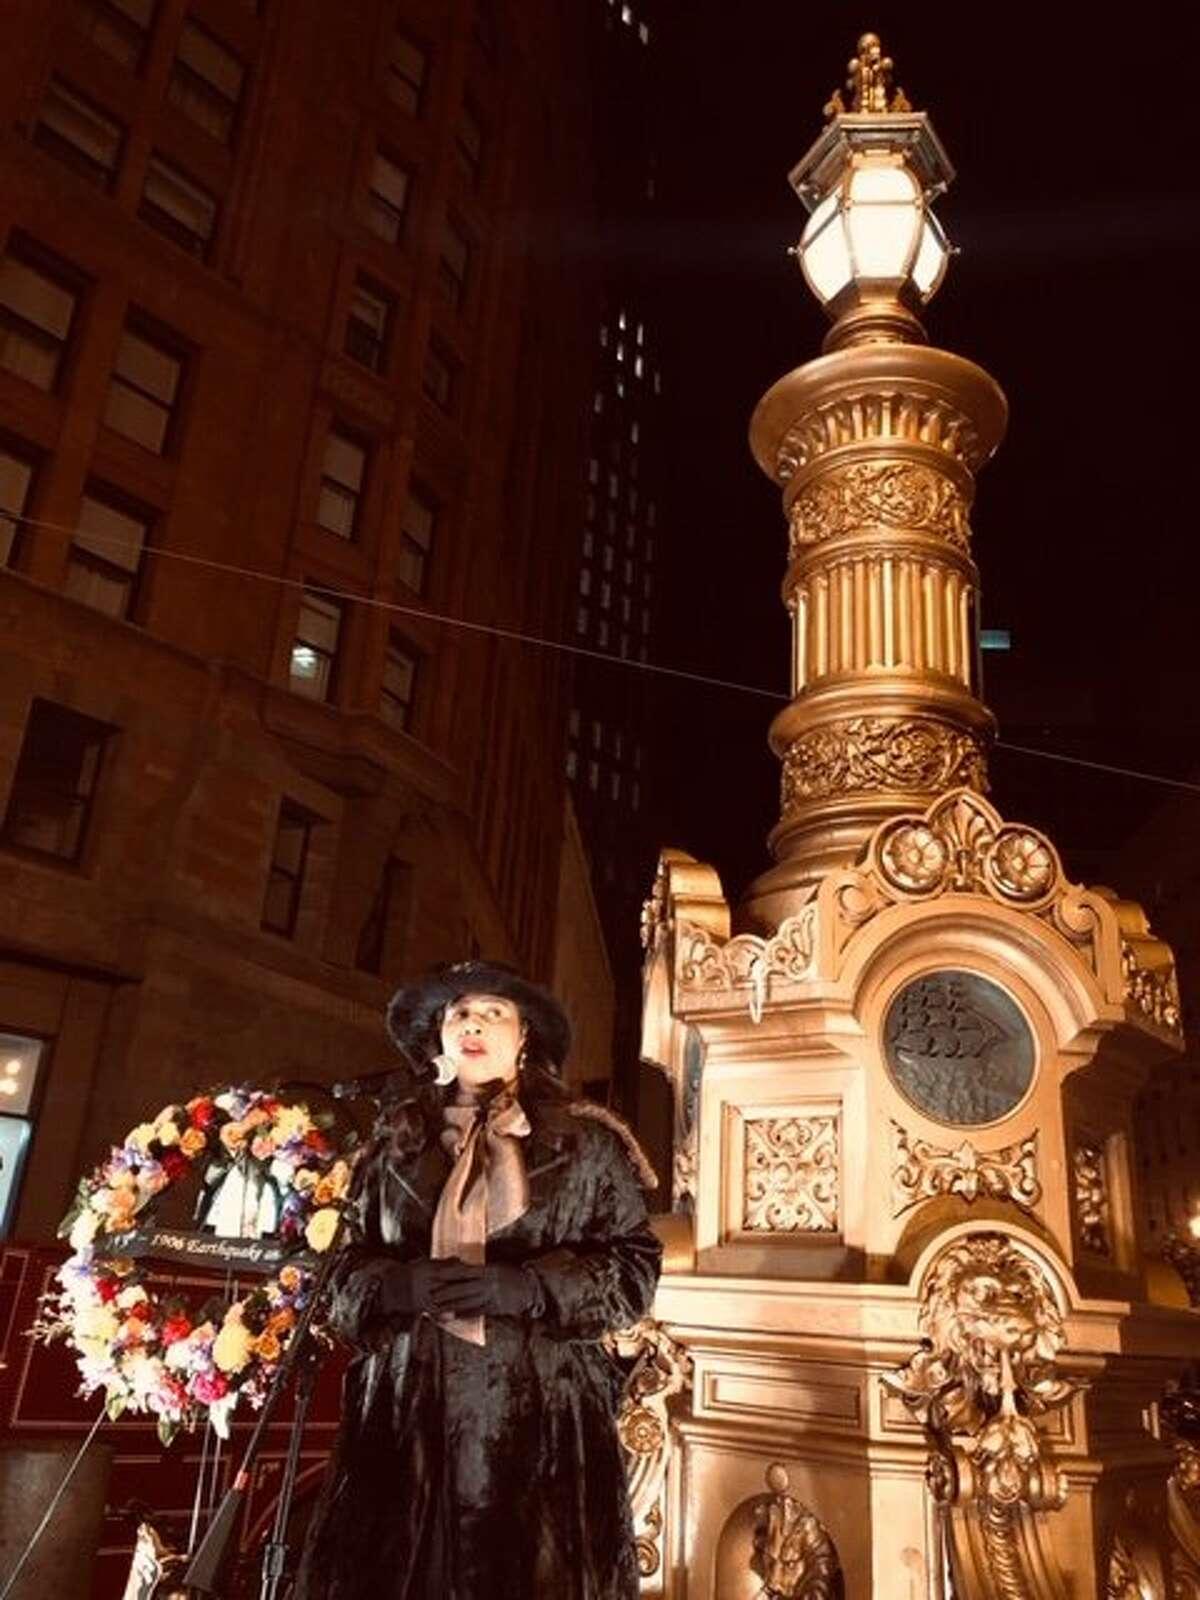 London Breed speaks at Earthquake Commemoration ritual